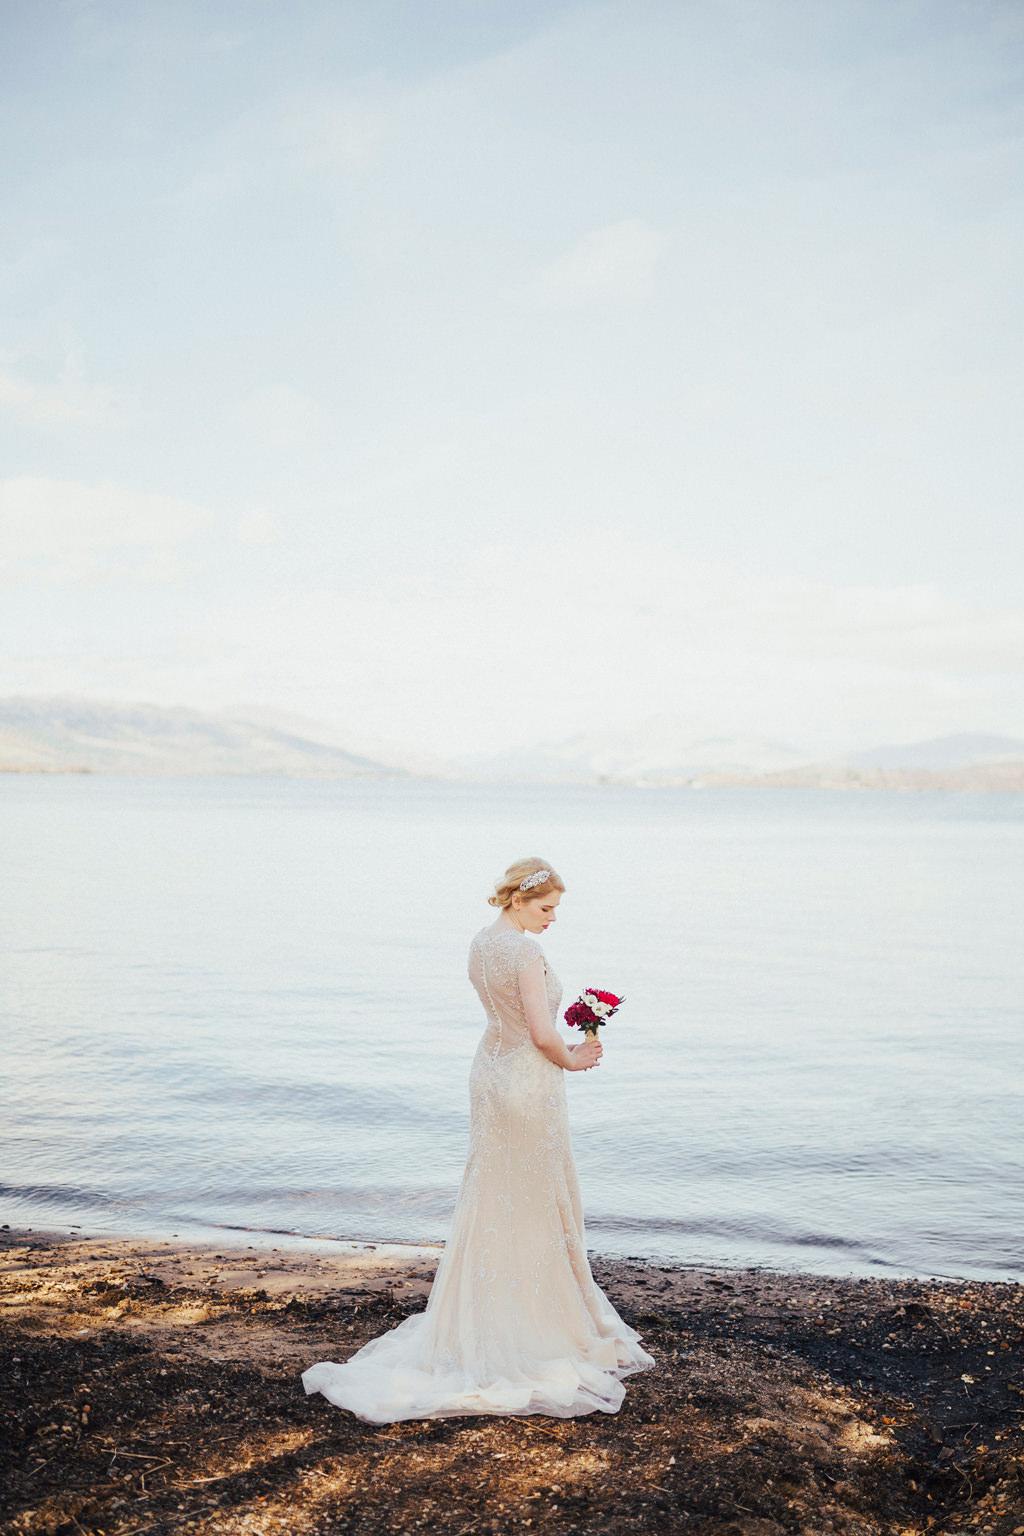 004-cameron-house-hotel-scotland-wedding-photography.jpg